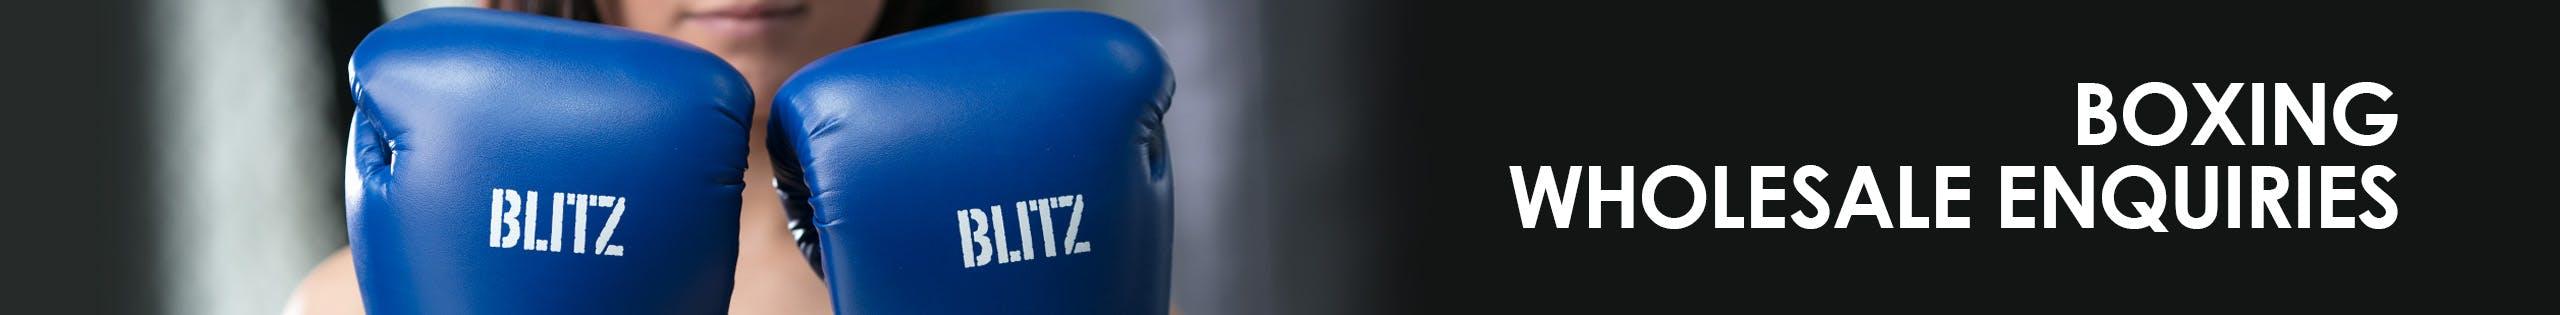 Blitz Boxing Wholesale Account Application